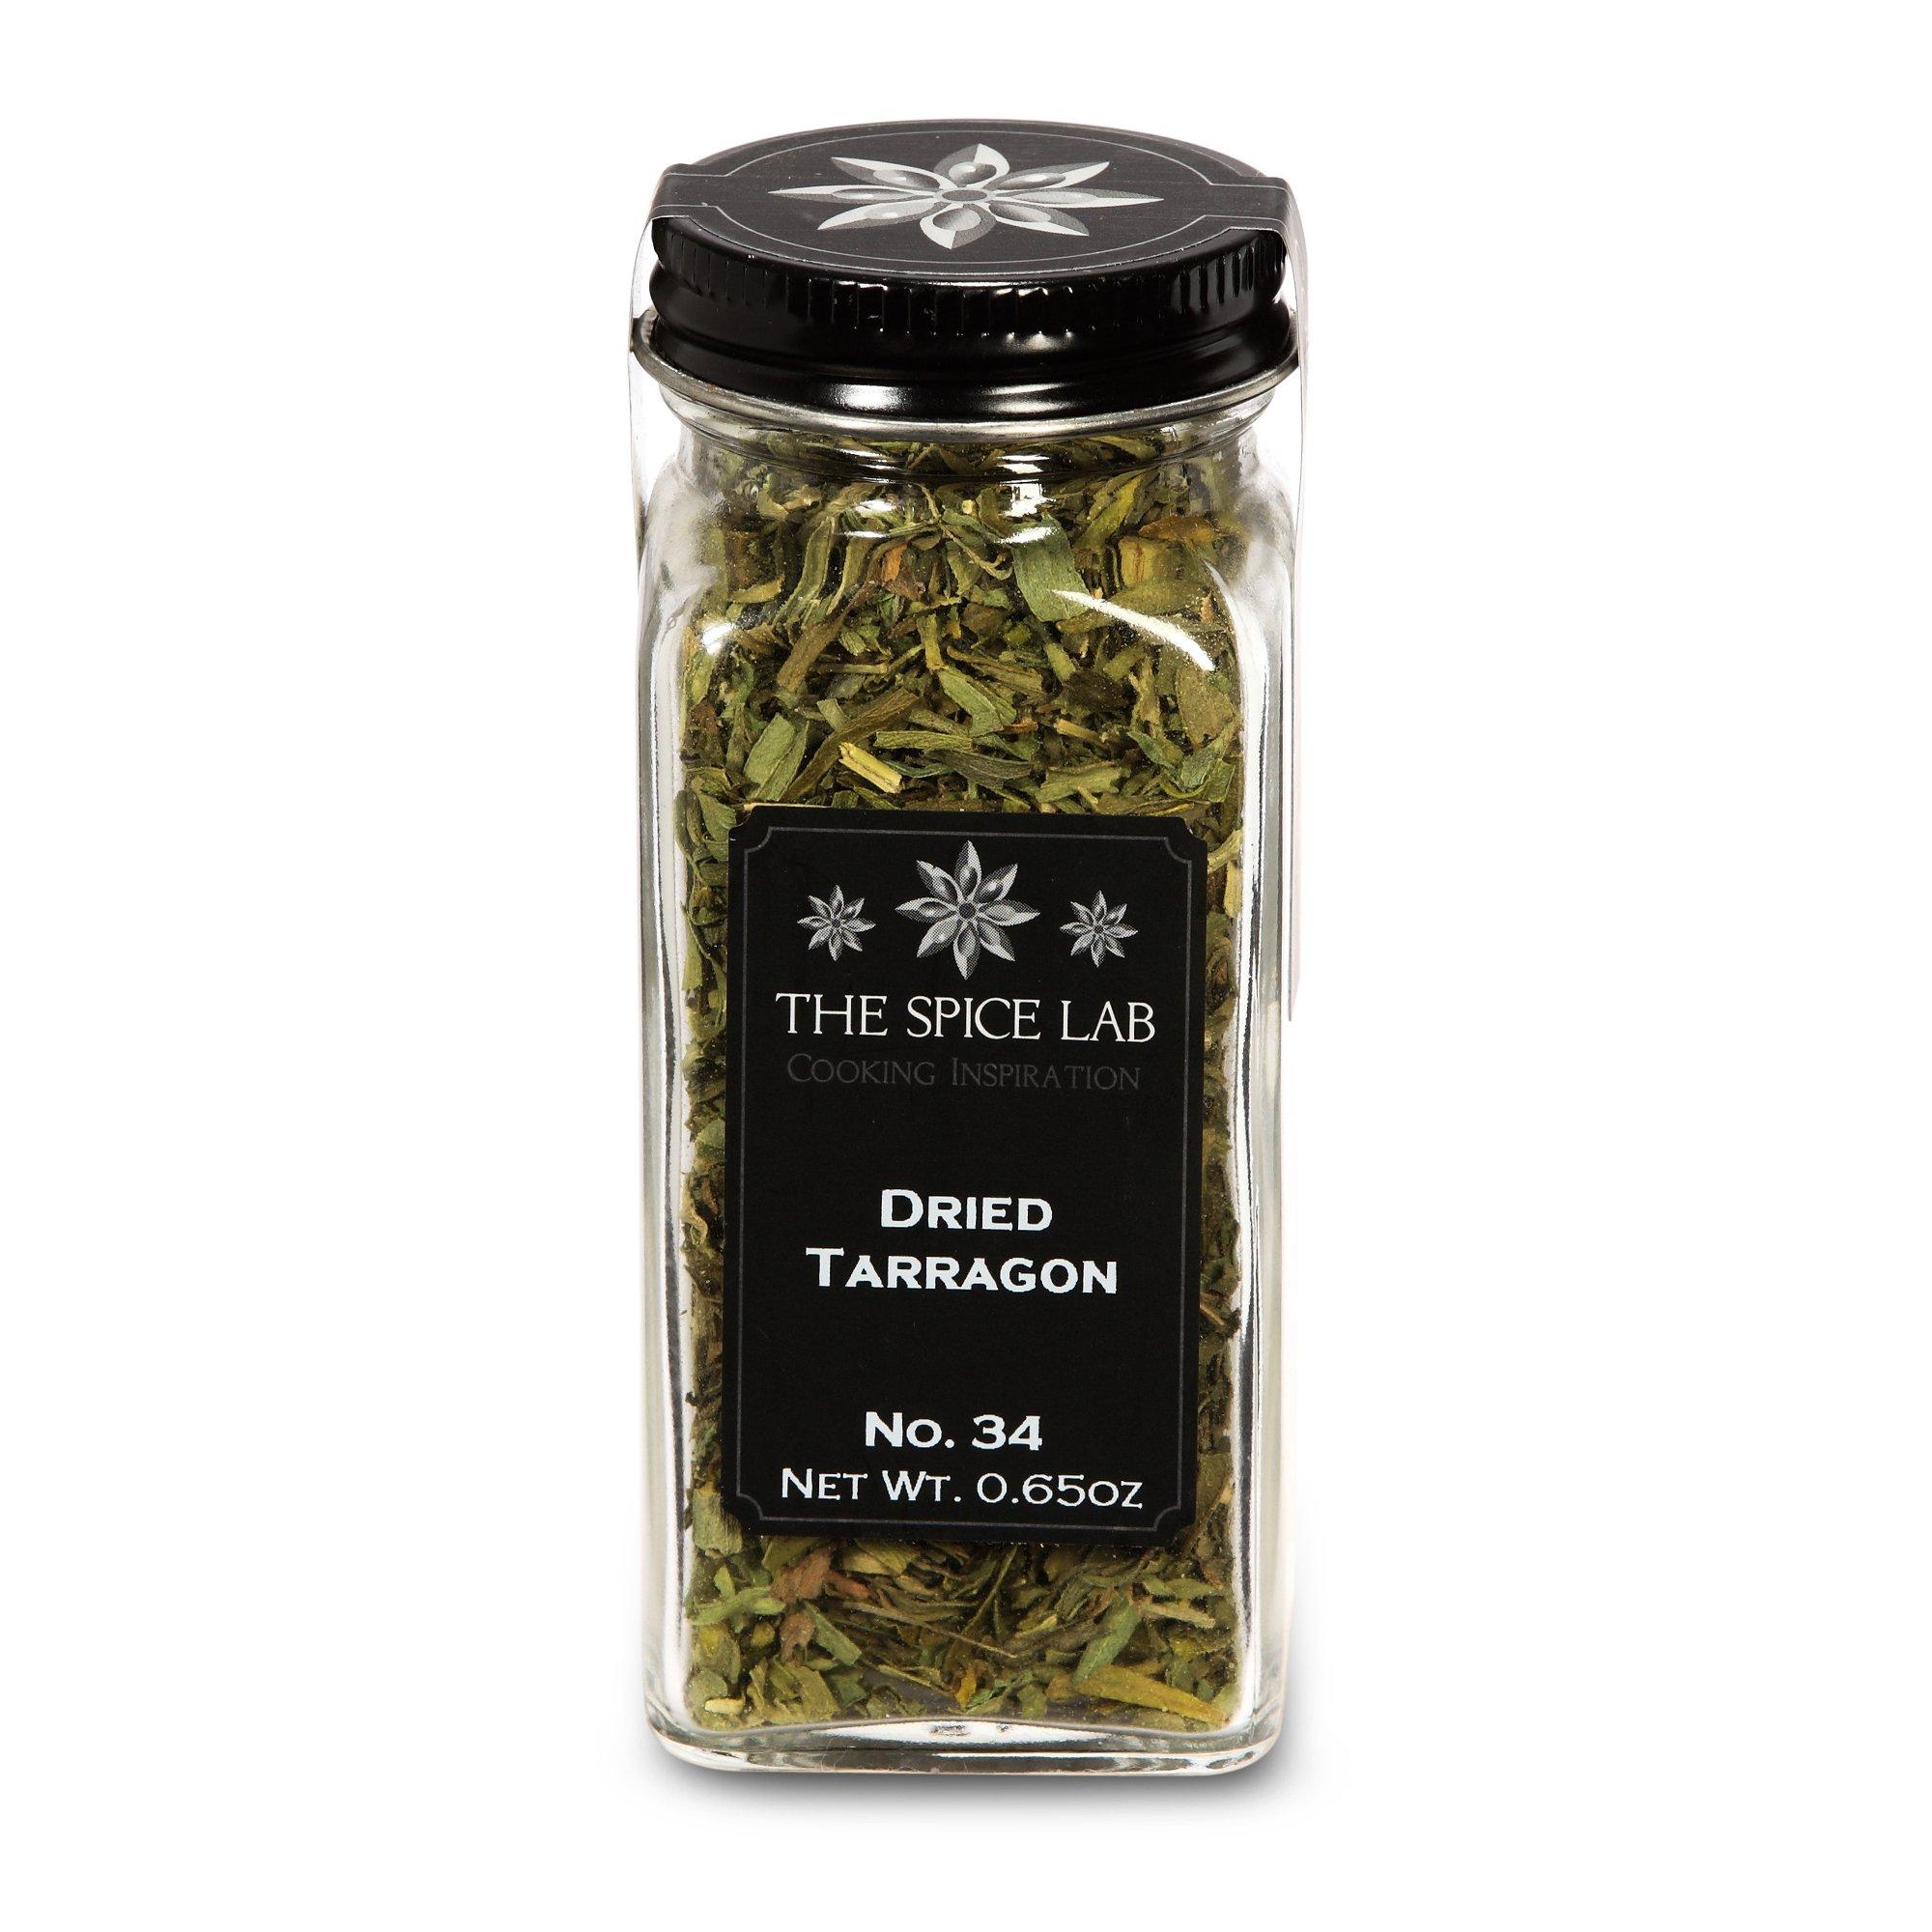 The Spice Lab No. 34 - Dried Tarragon - All Natural Kosher Non GMO Gluten Free Spice - French Jar